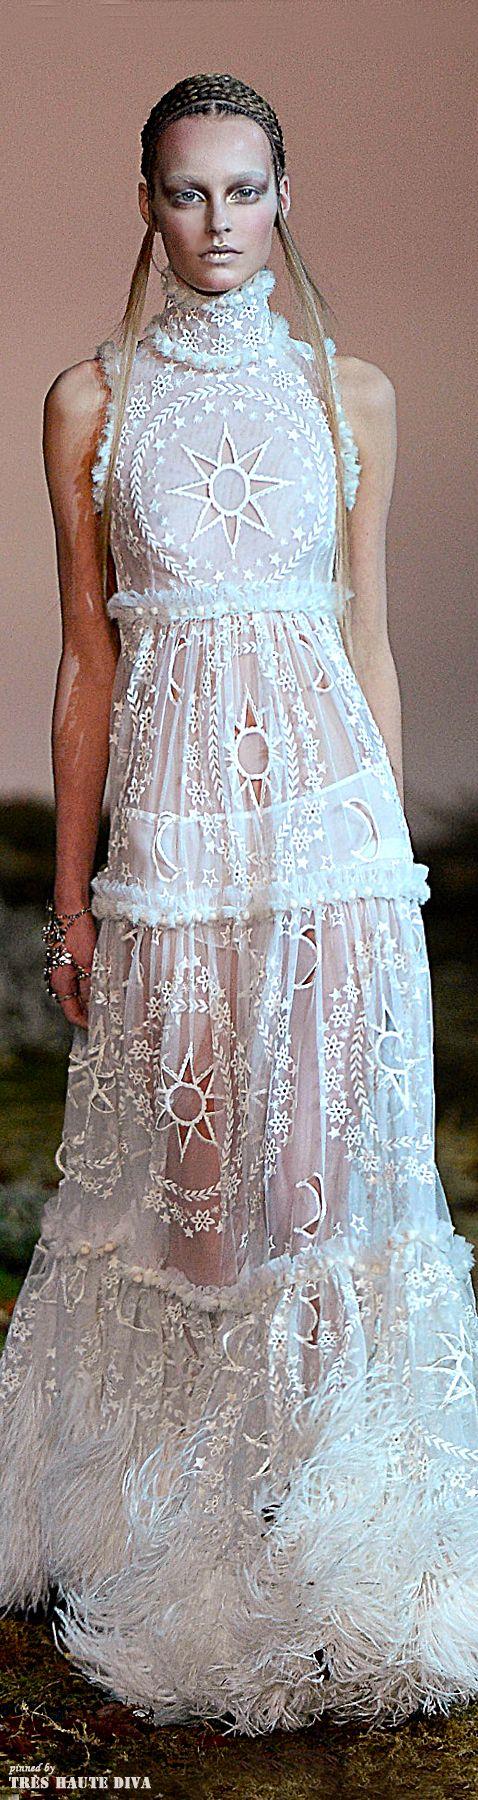 Alexander McQueen Fall/Winter 2014 RTW // Paris Fashion Week                                                                                                                                                      More